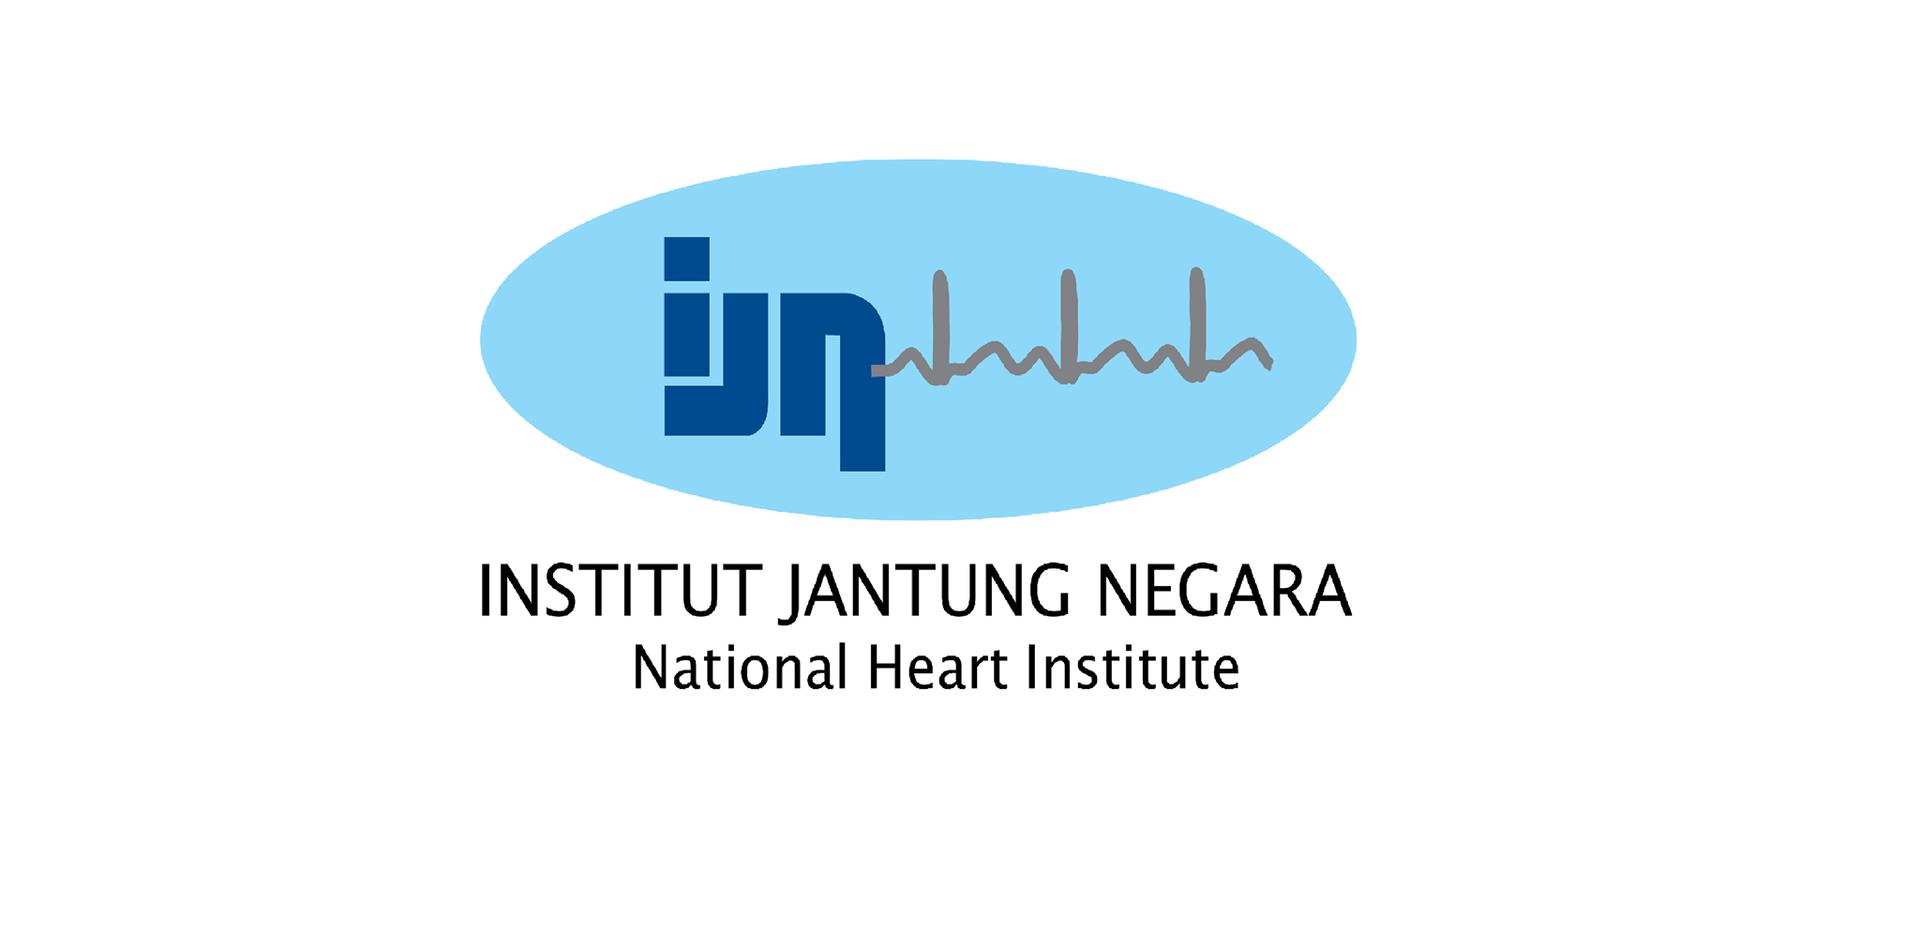 institut-jantung-negara.png